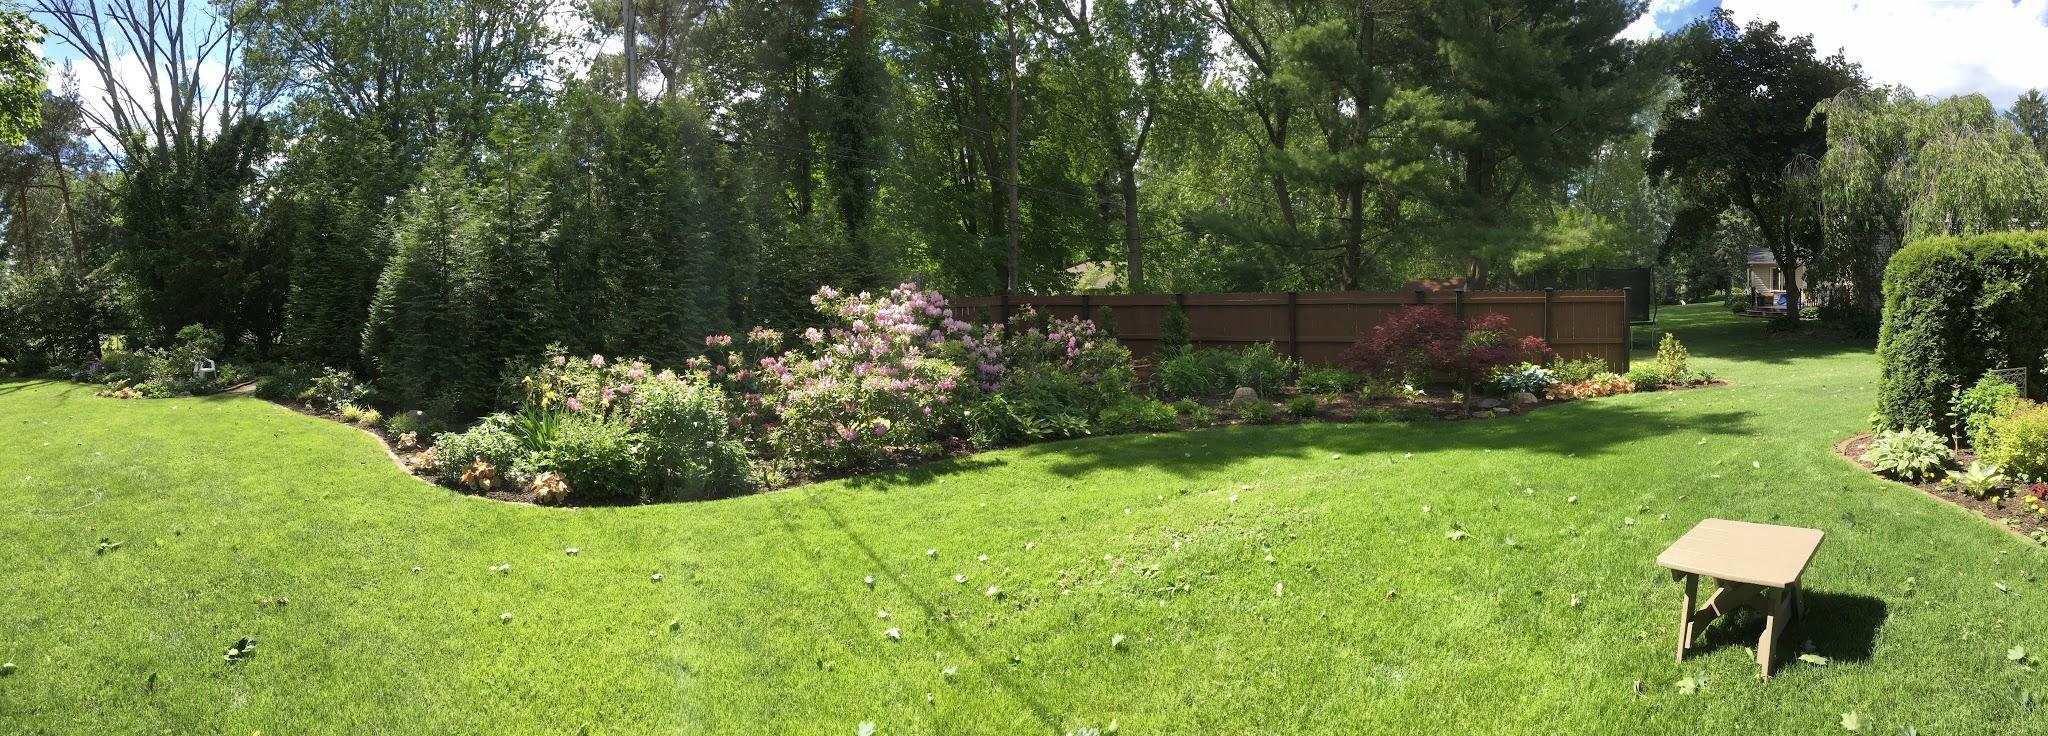 large backyard garden bed